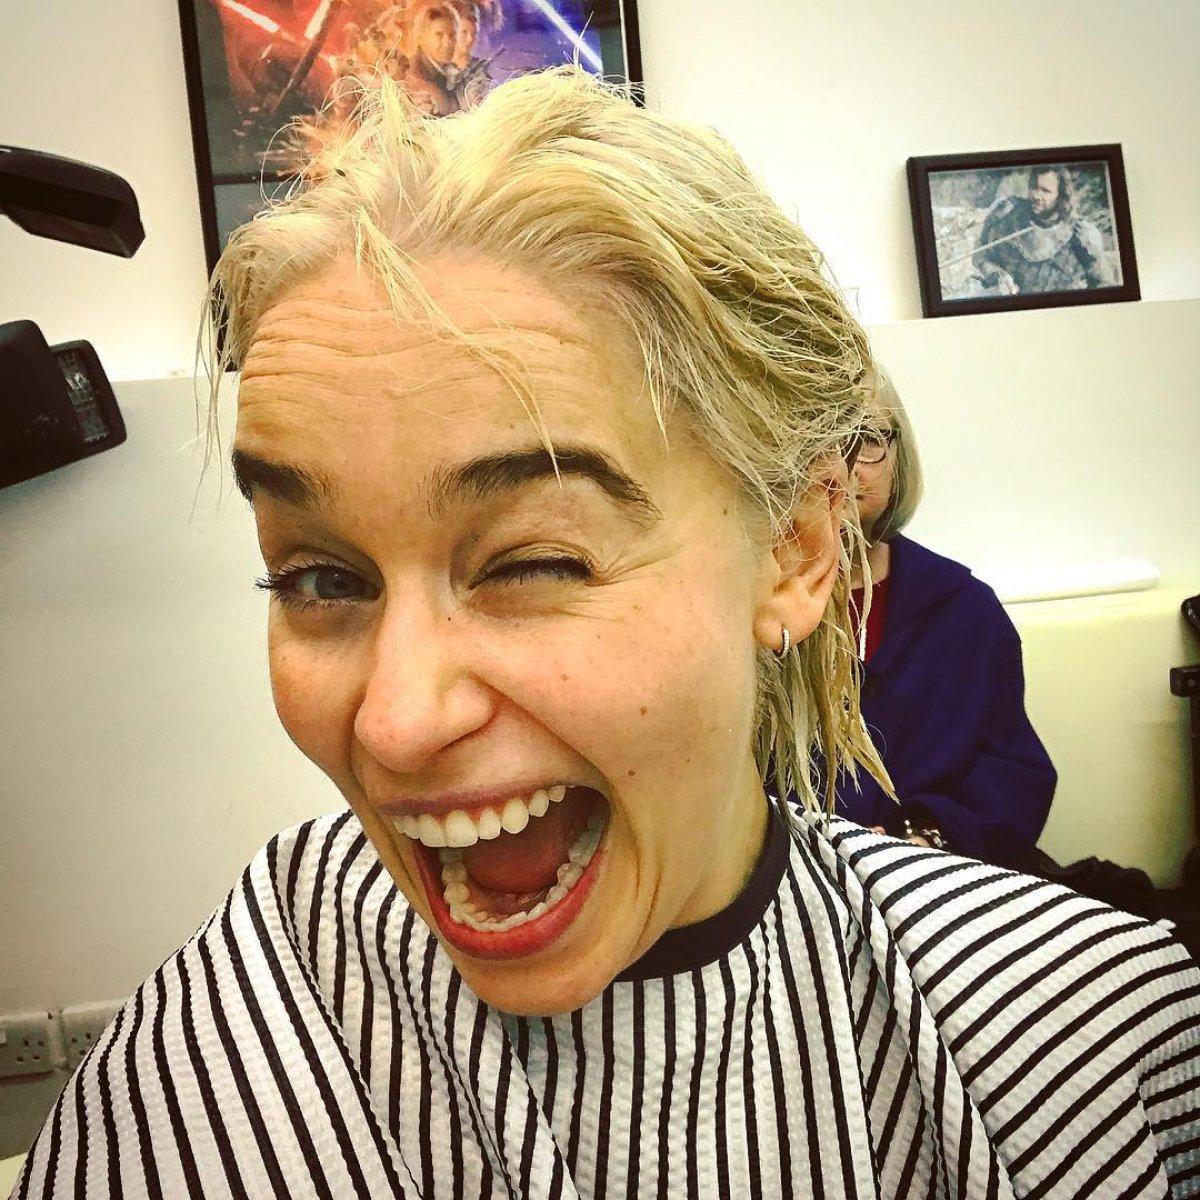 Khaleesi actress dating aaron